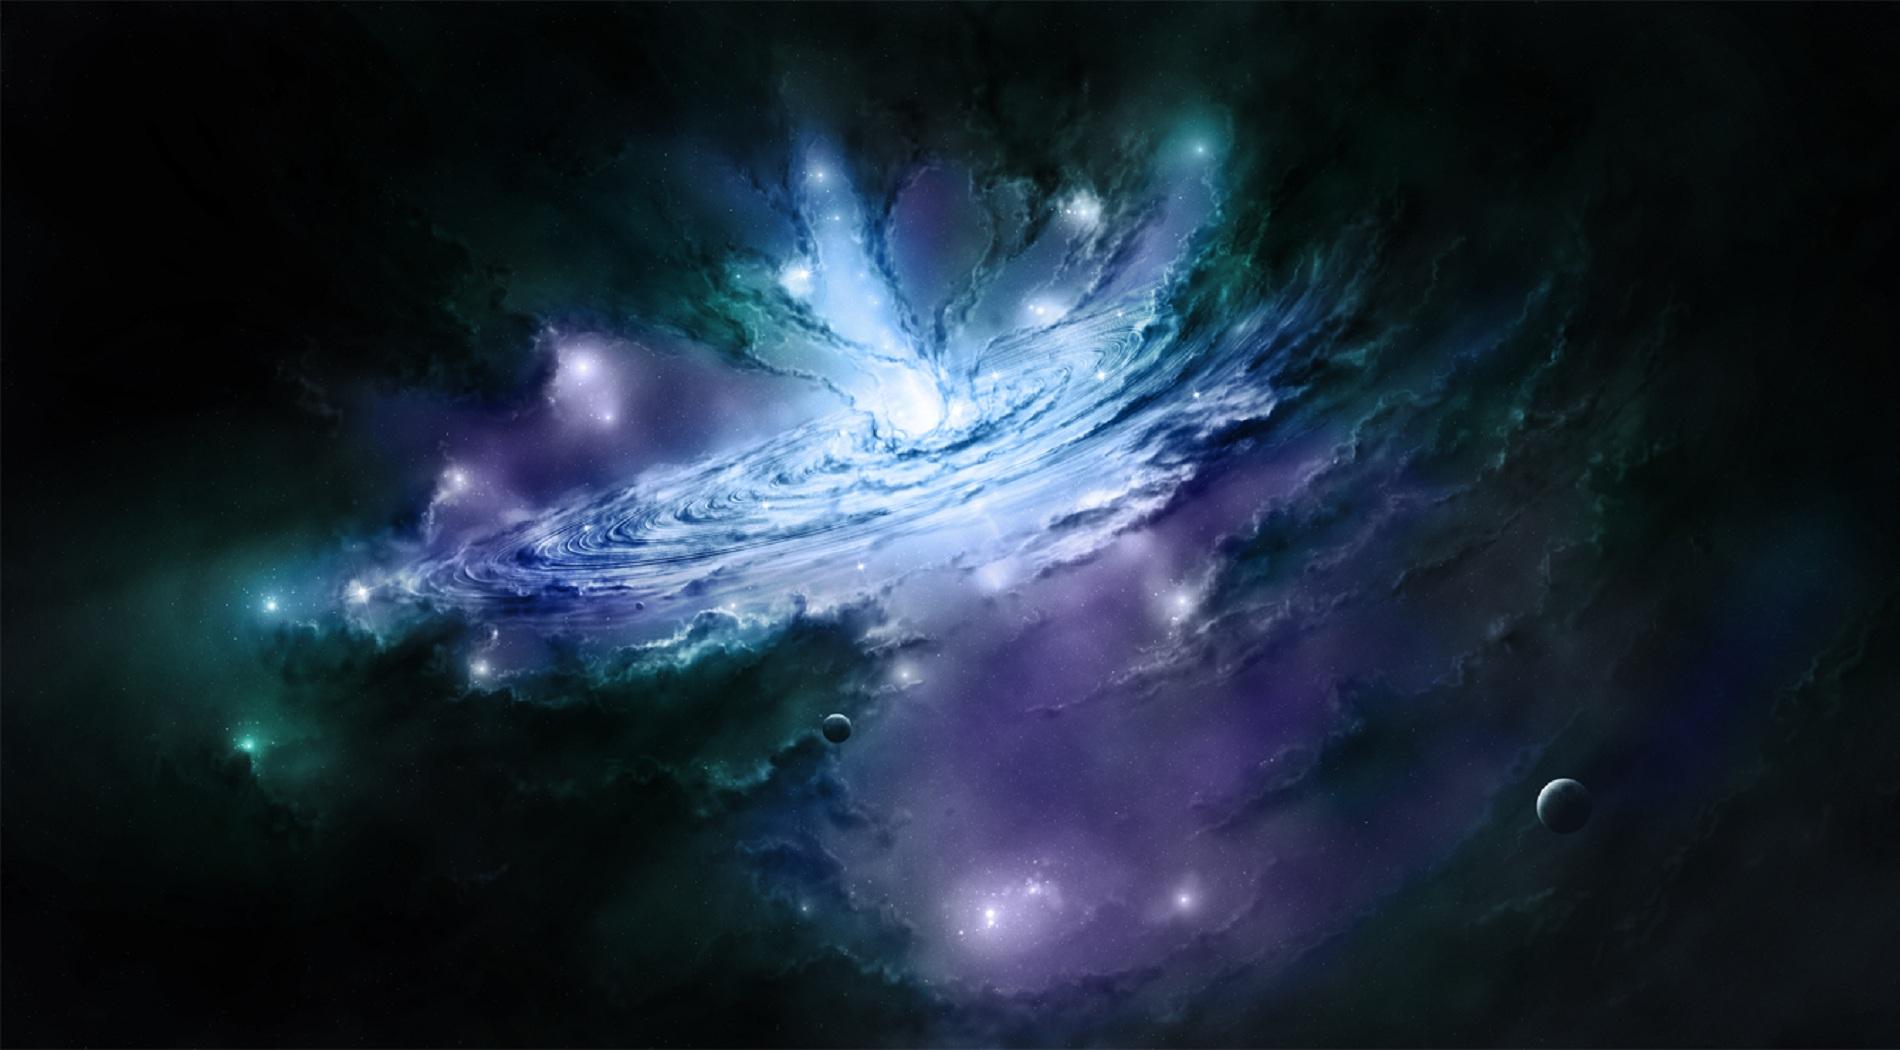 Black Hole Desktop Wallpapers 1900x1050